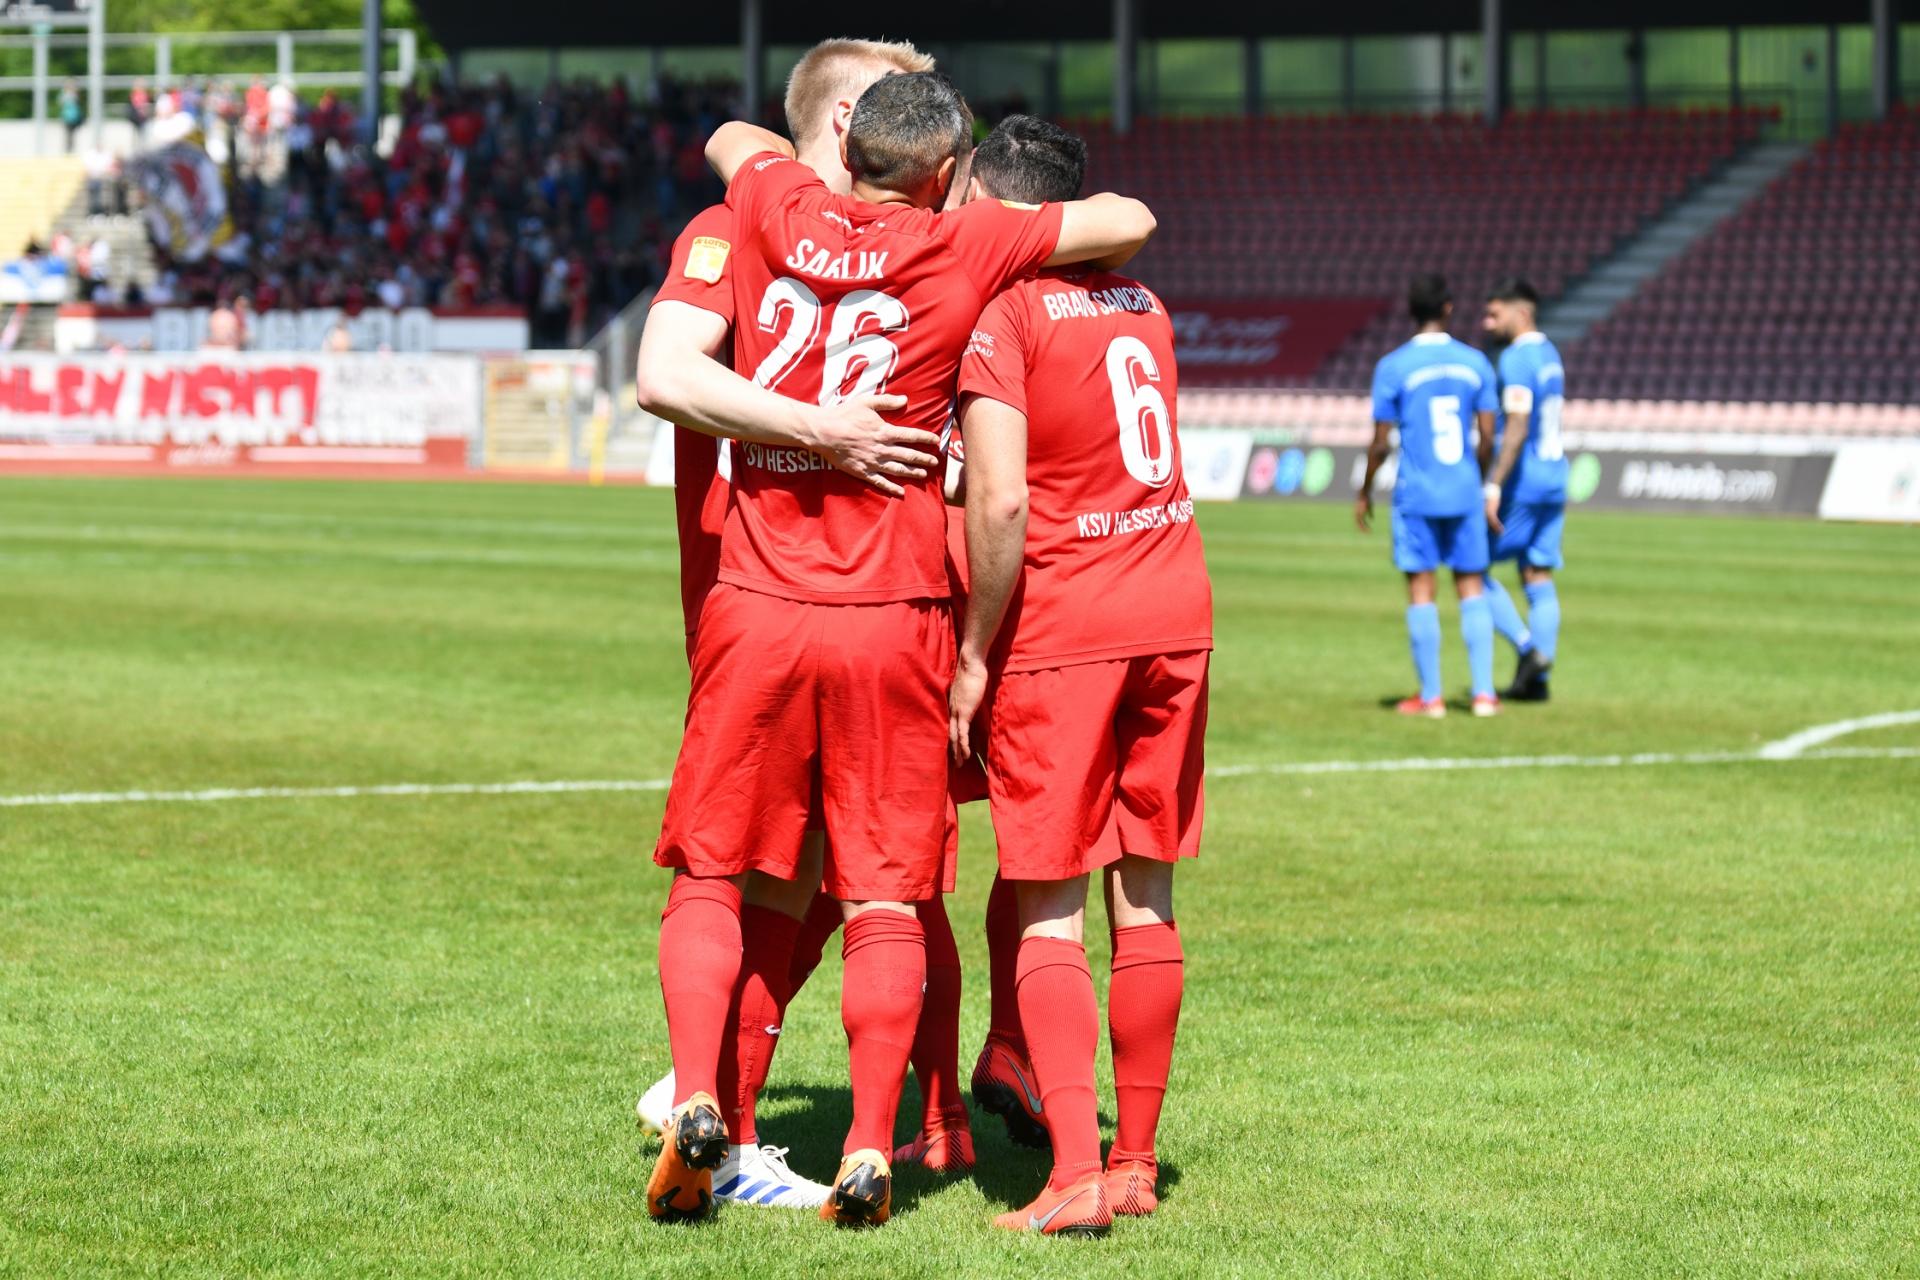 Lotto Hessenliga 2018/2019, KSV Hessen Kassel, T�rk G�c� Friedberg, Endstand 4:0; Jubel zum 2:0